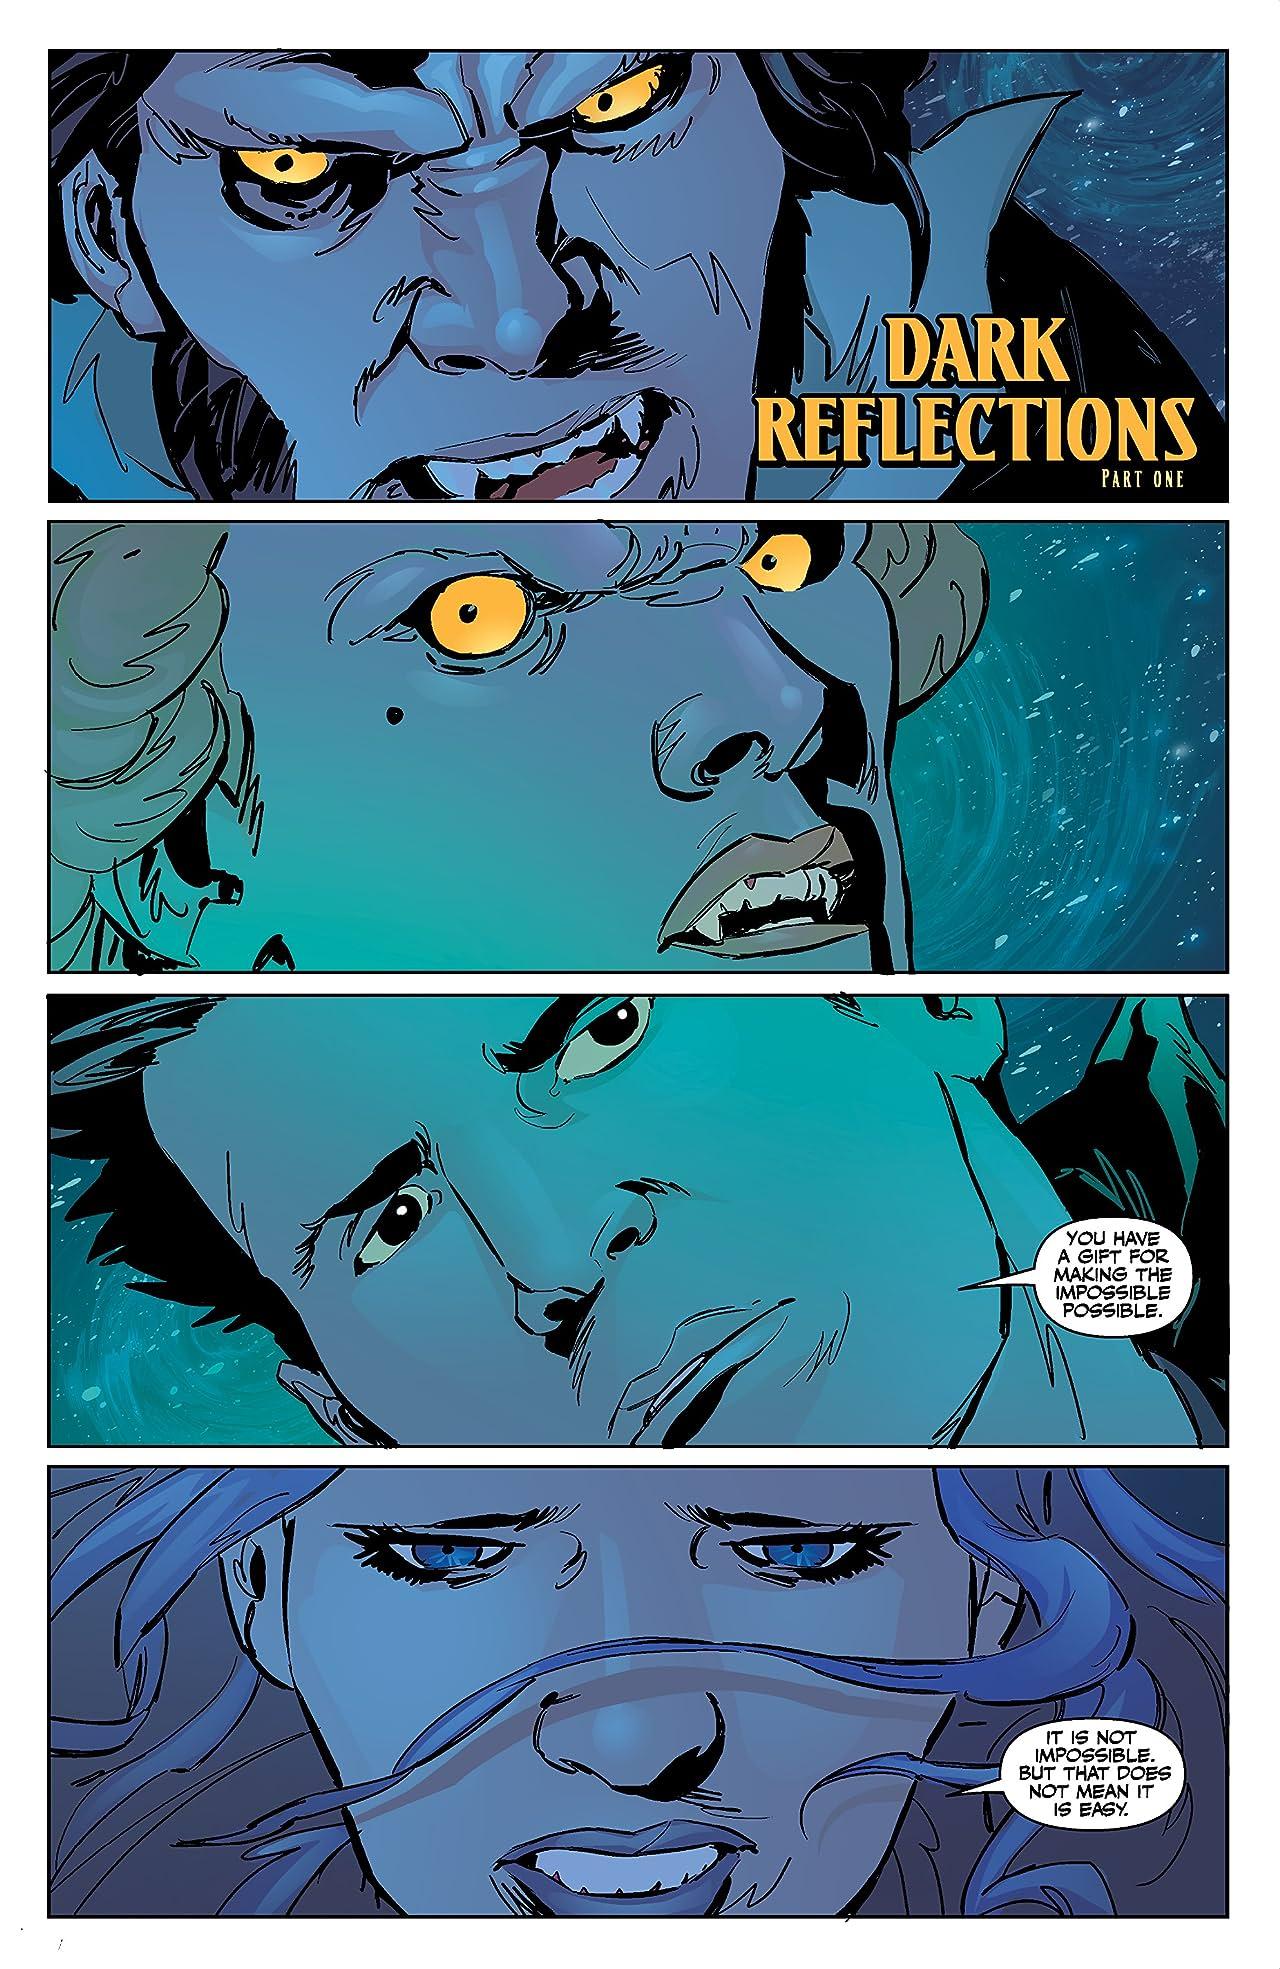 Angel: Season 11 Vol. 3: Dark Reflections